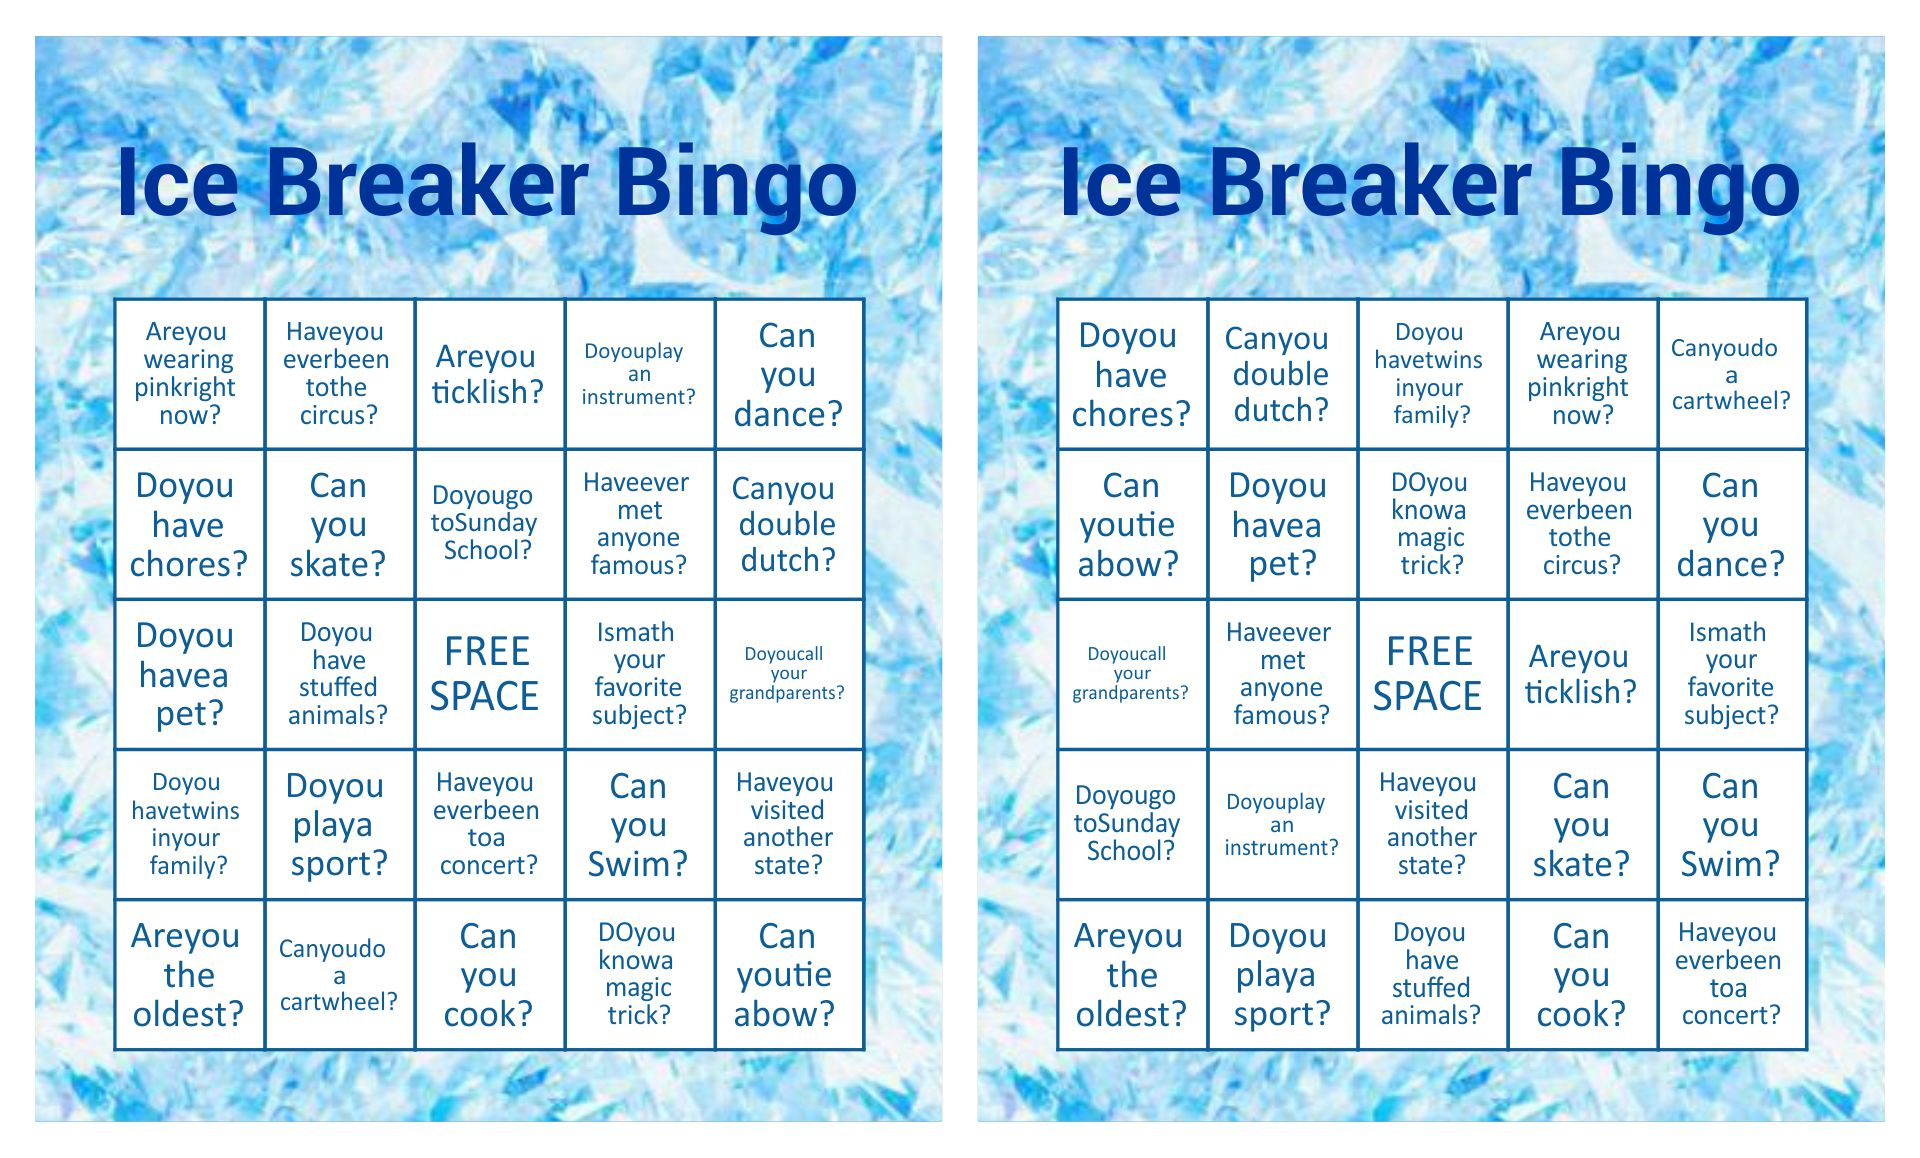 Ice Breaker Bingo Game Printable